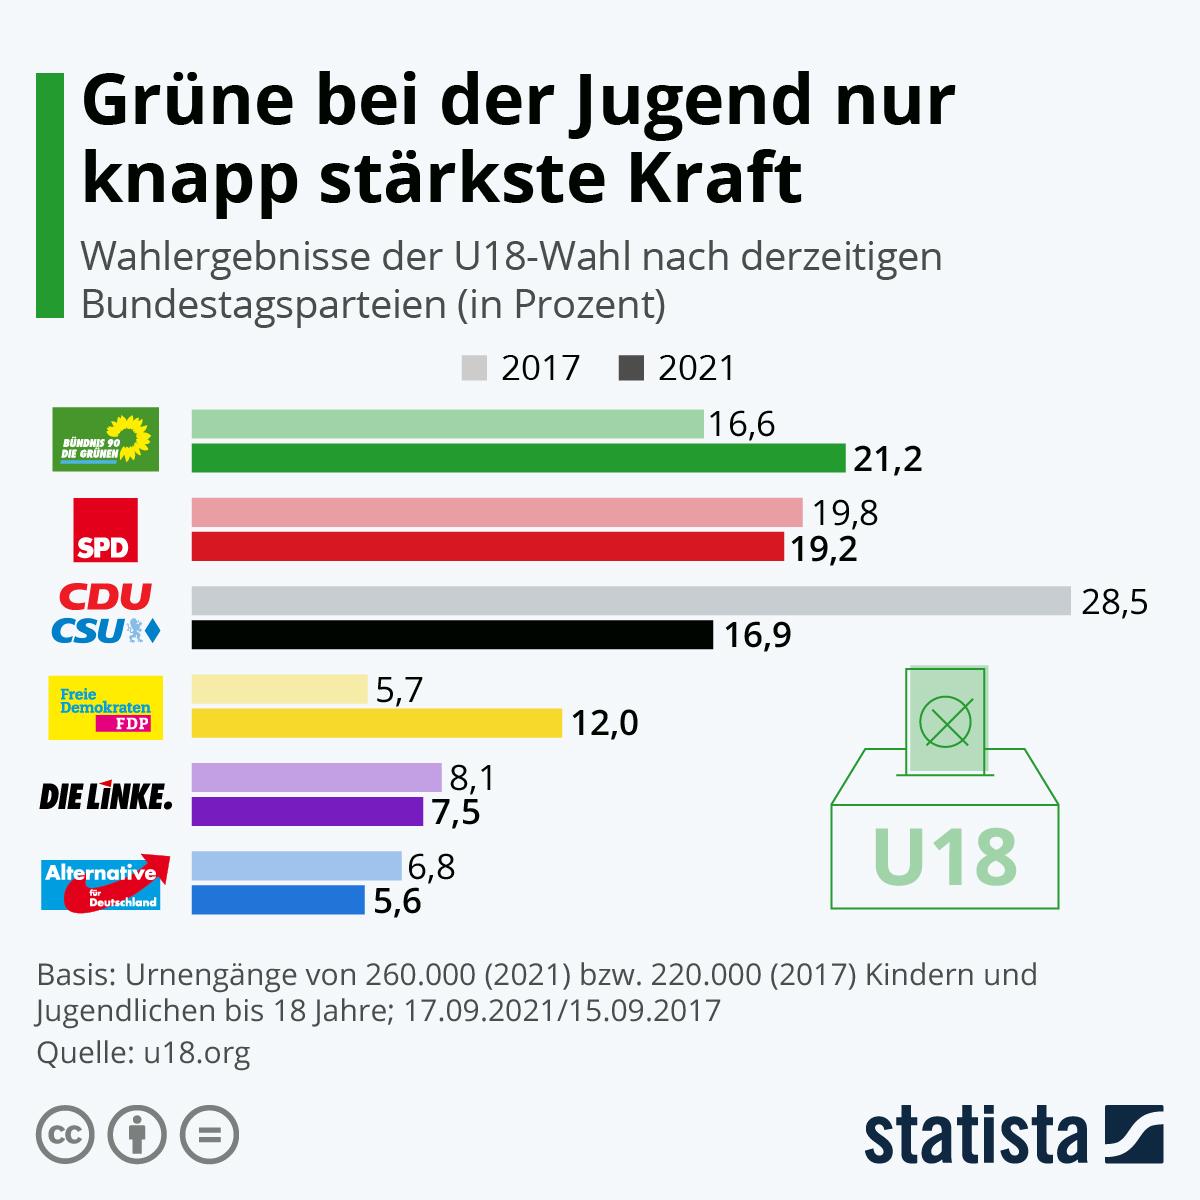 Infografik Grüne bei der Jugend nur knapp stärkste Kraft   Statista